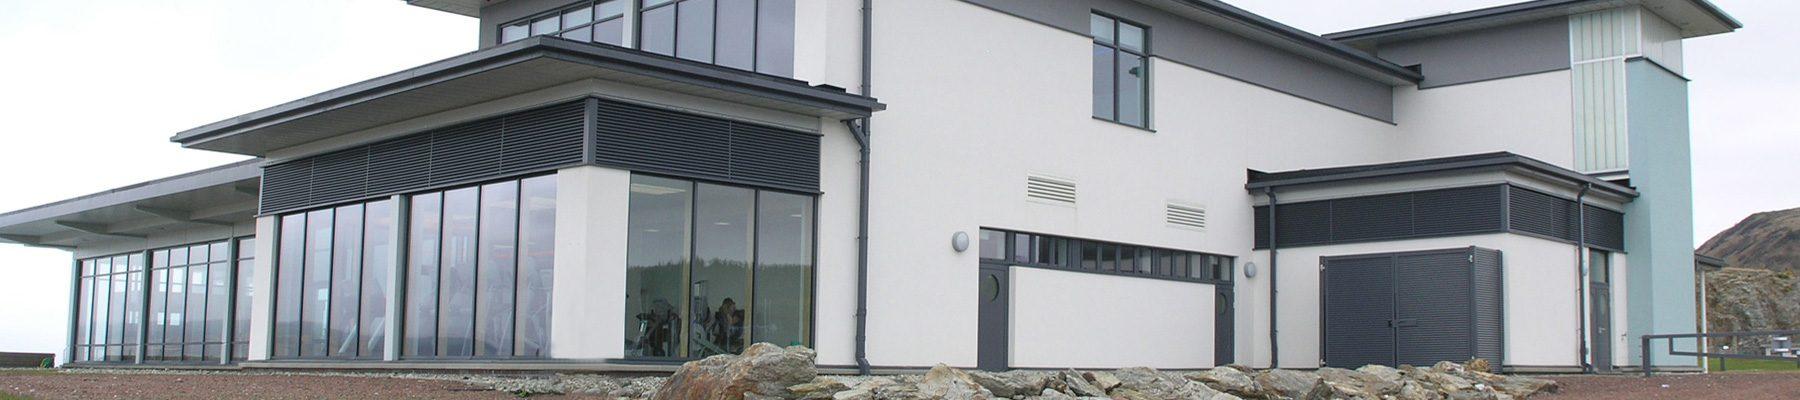 Steel-Louvred-Screen-plant-housing-Italia-100-Portavadie-1-banner-b